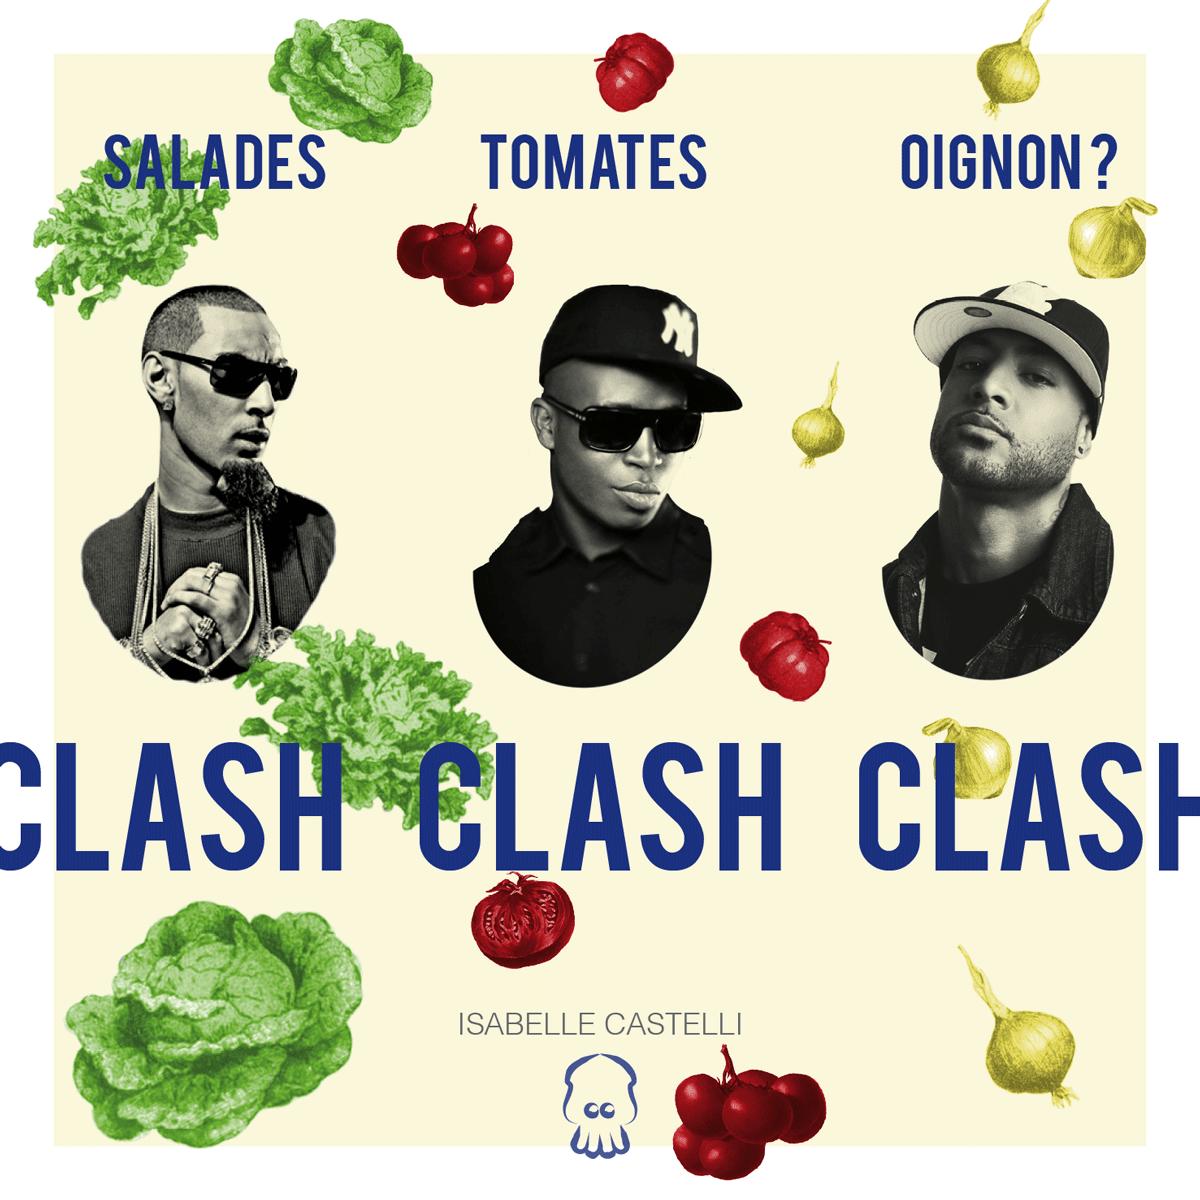 Salades, tomates, oignon ? Clash clash clash… [Episode 1]